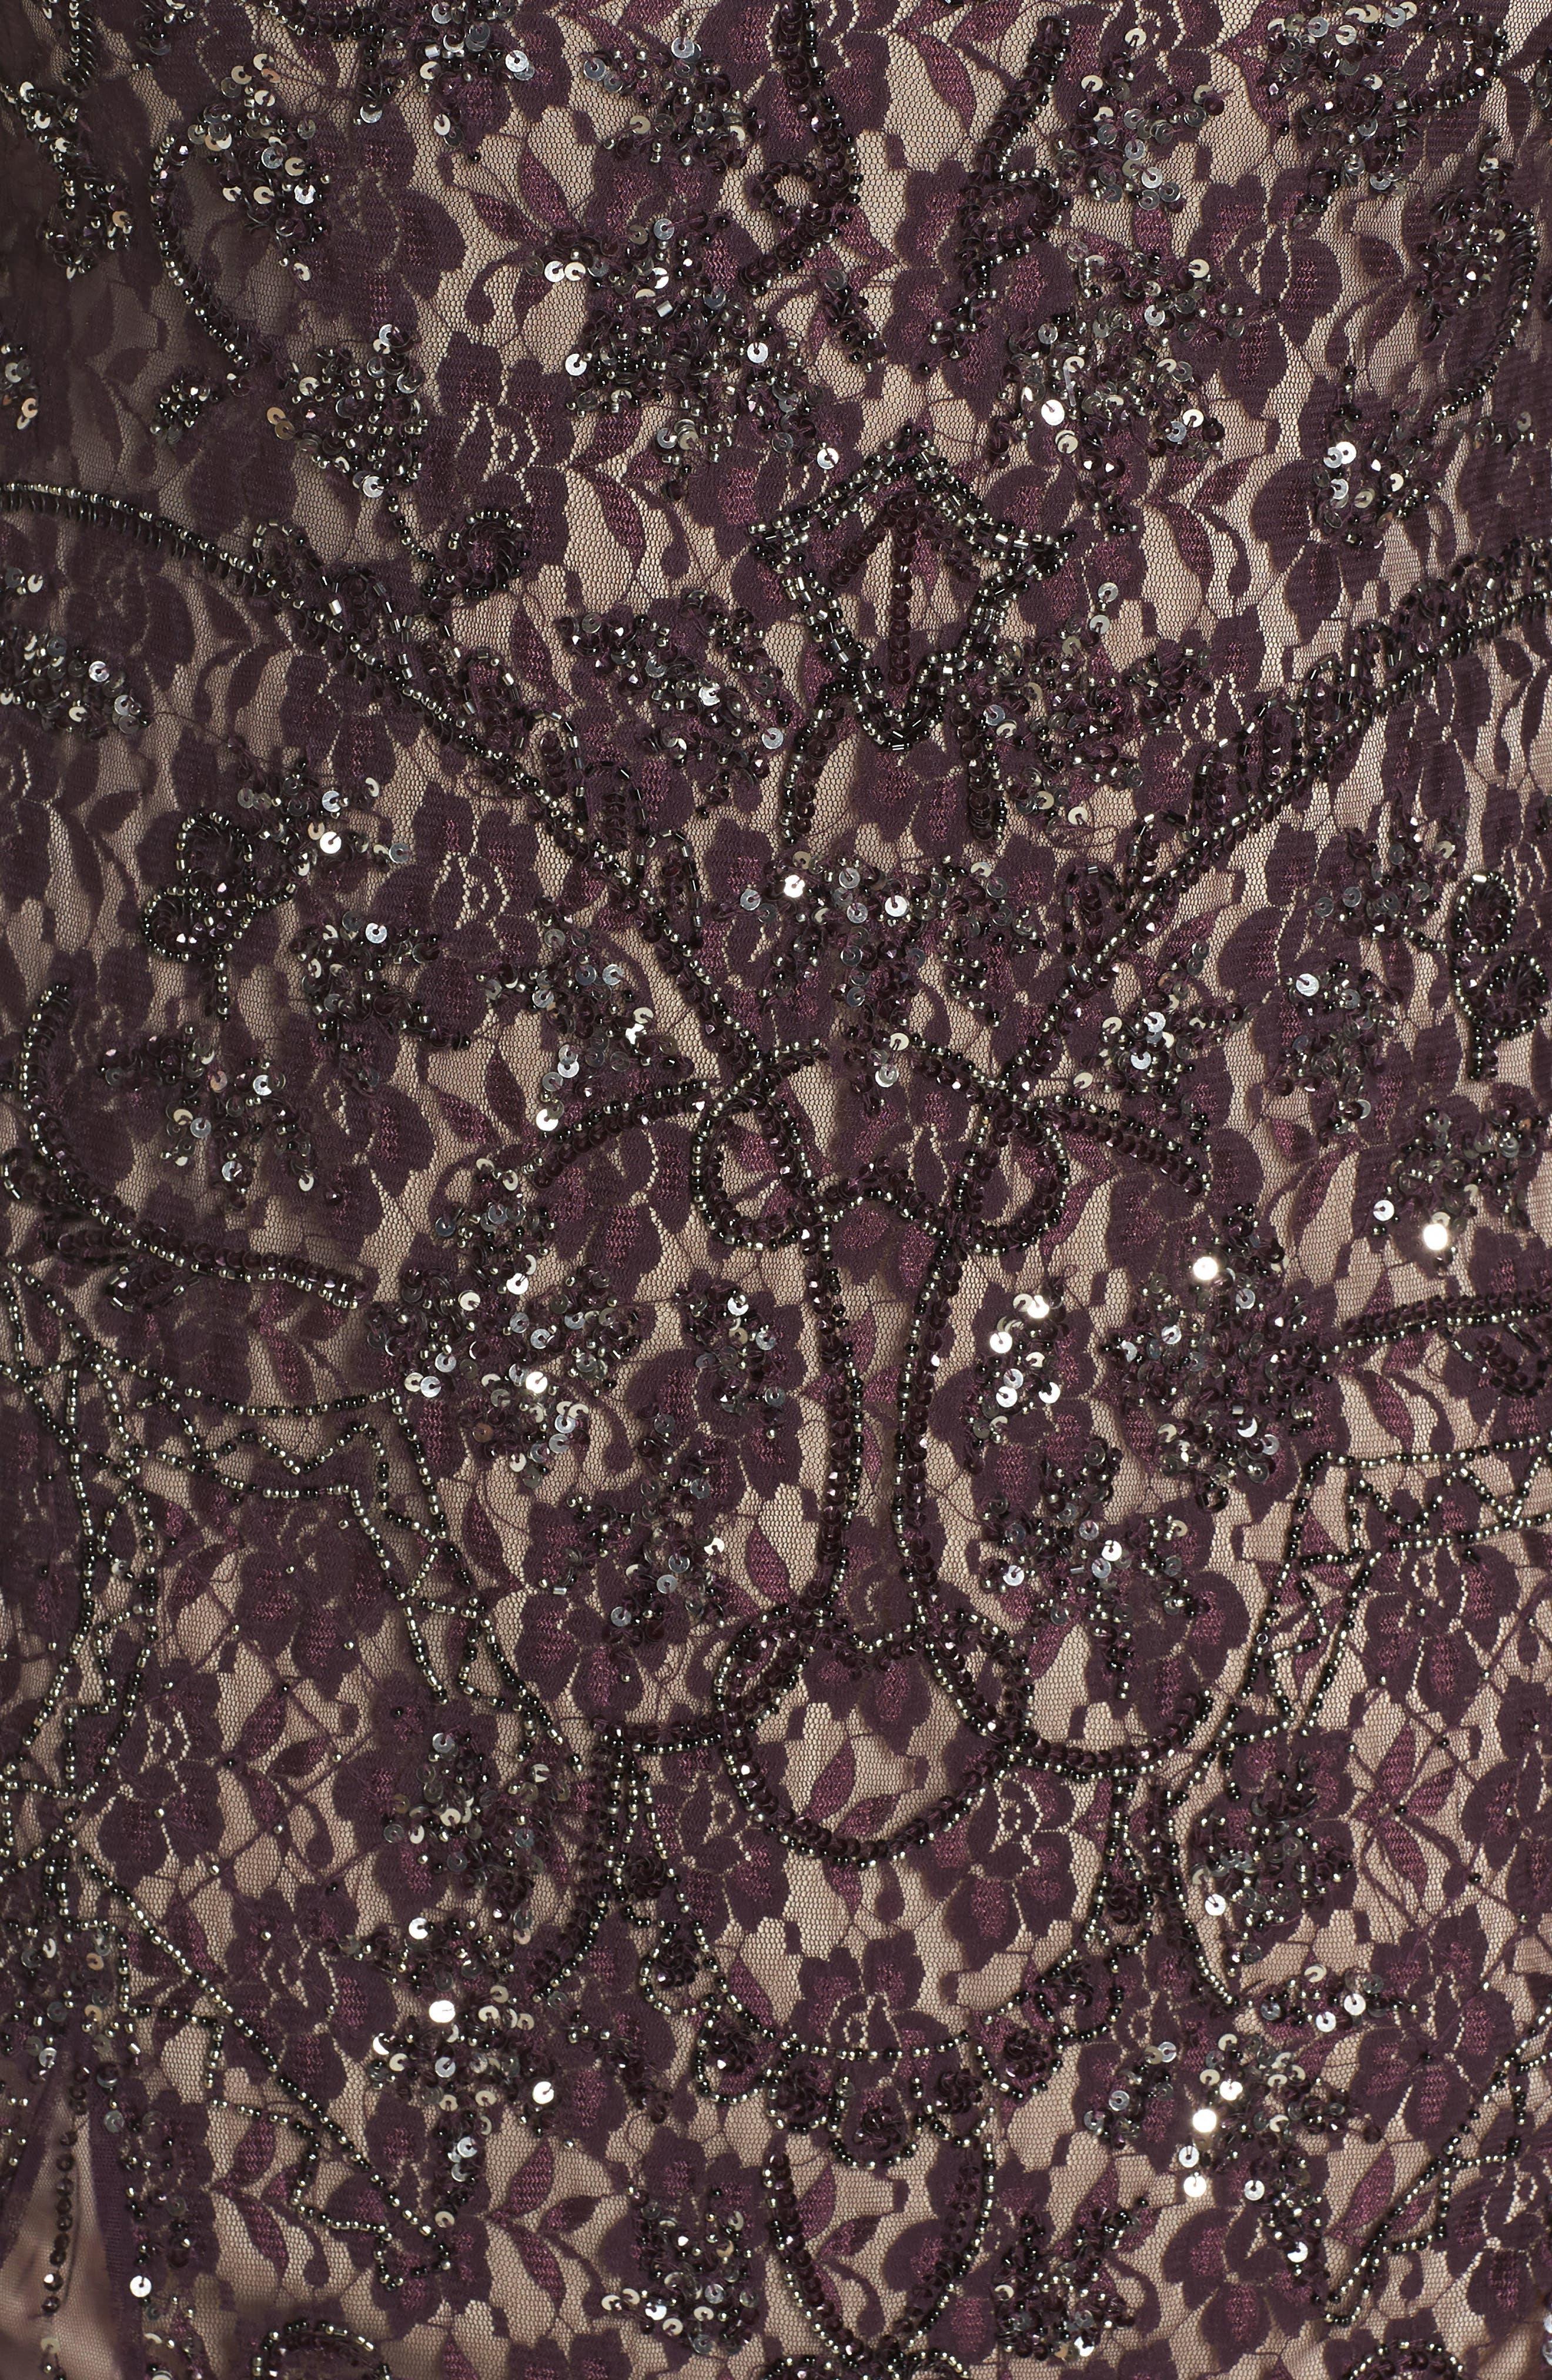 Embellished Lace A-Line Dress,                             Alternate thumbnail 5, color,                             Plum